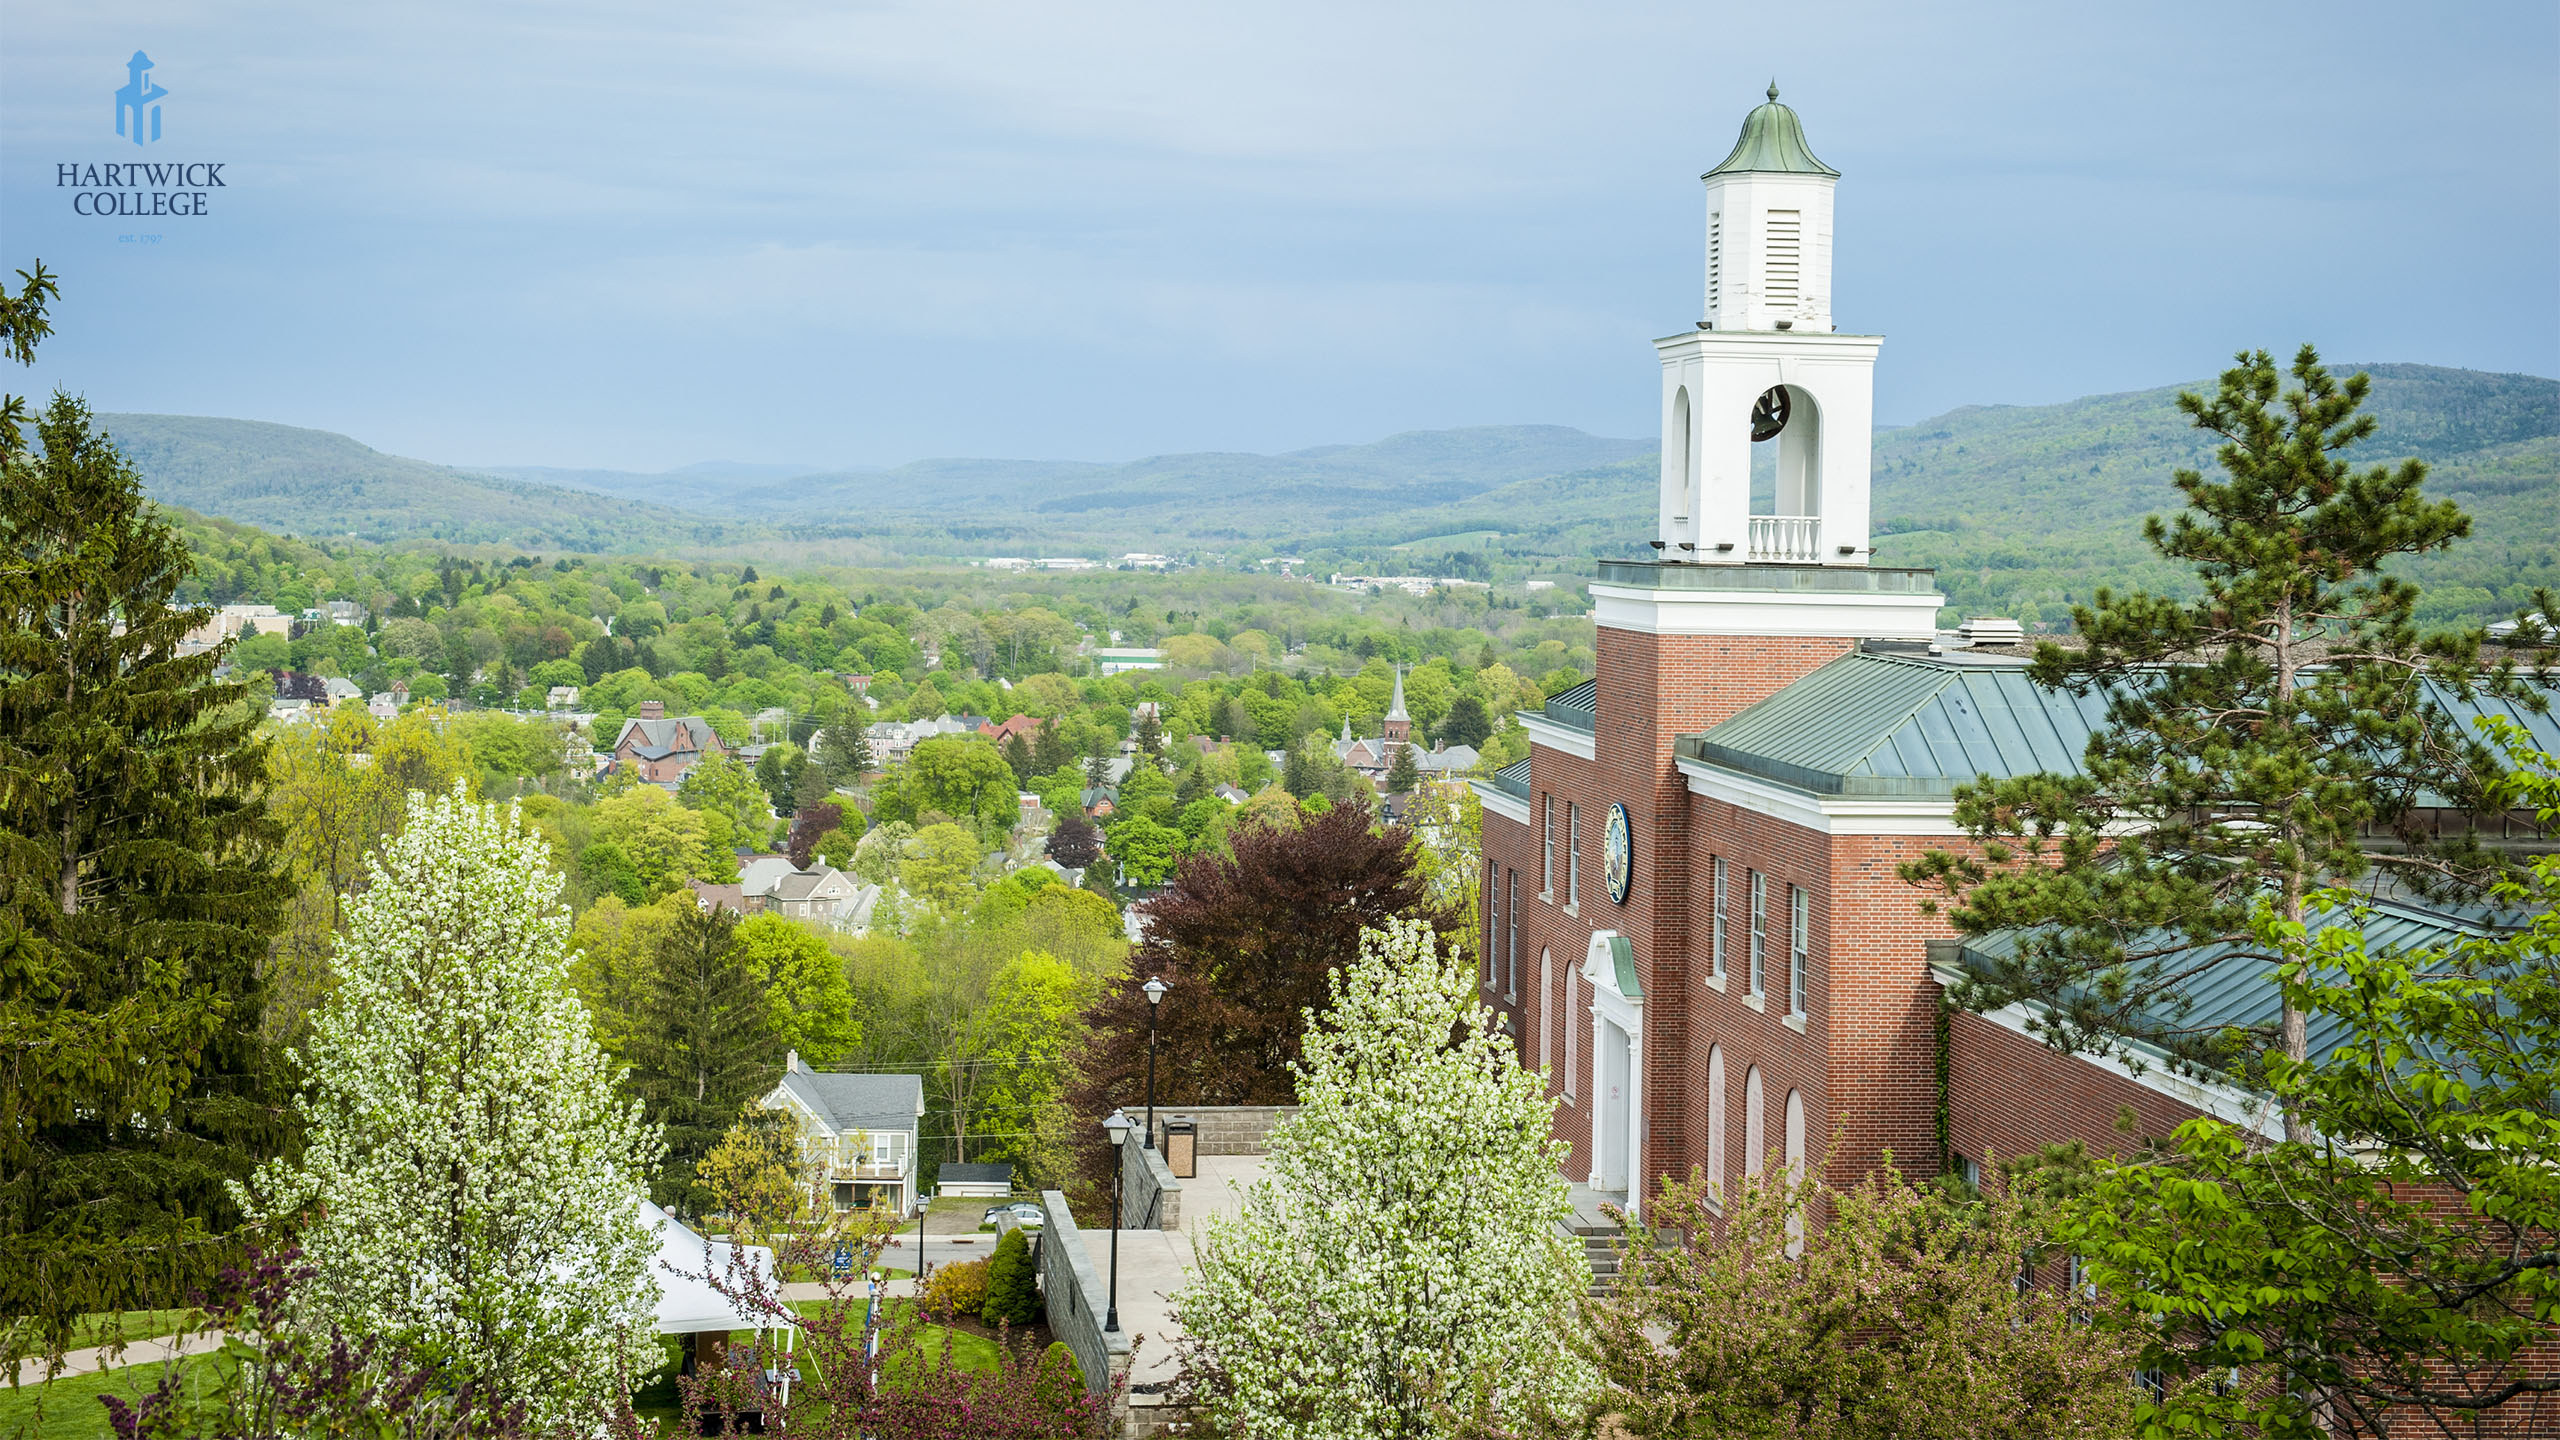 Hartwick-College-NY.jpg